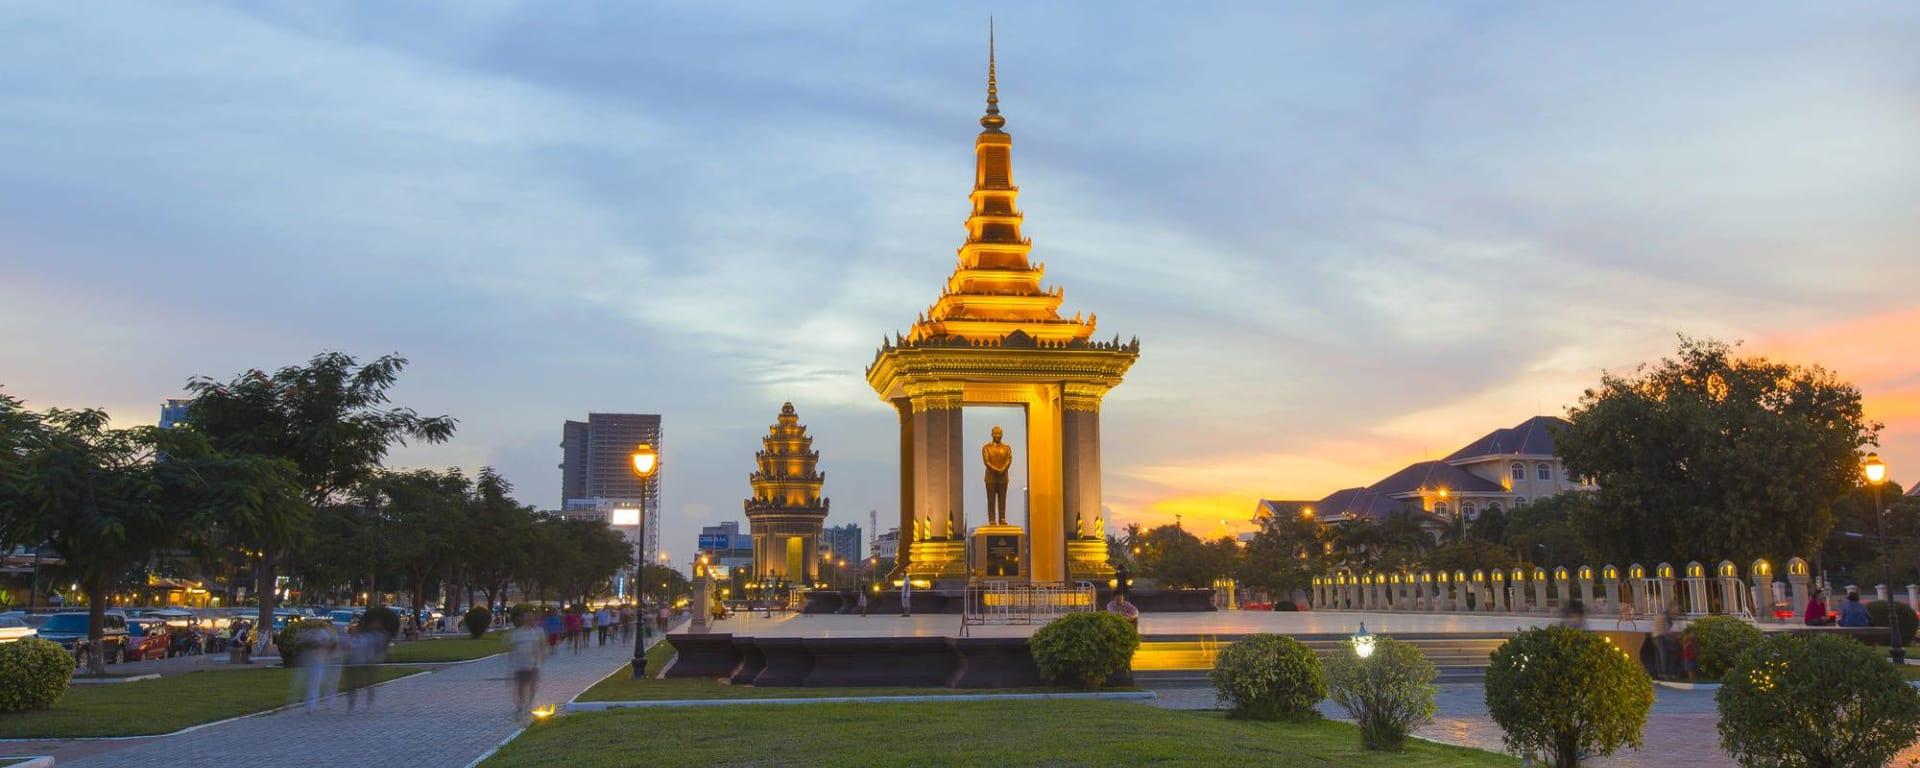 Stadtrundfahrt mit dem Tuk-Tuk in Phnom Penh: Phnom Penh King Father Norodom Sihanouk Statue